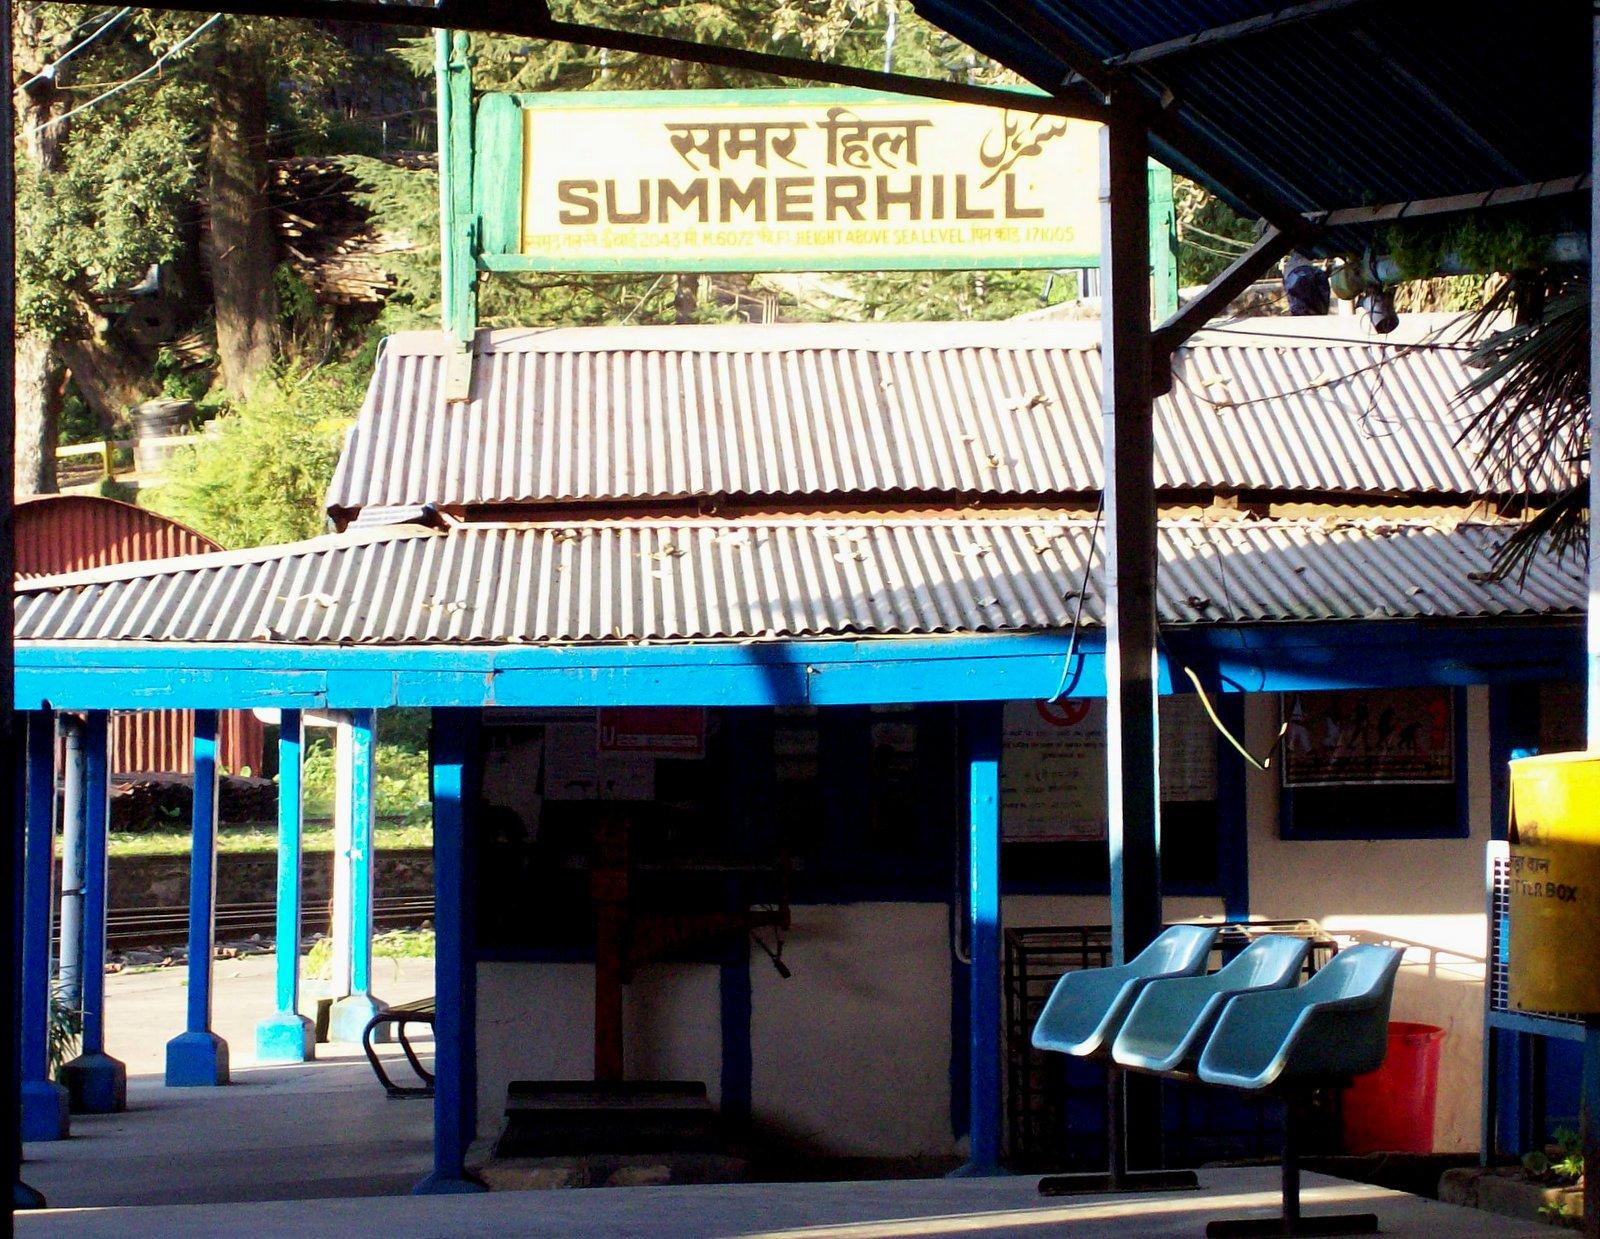 Kalka - Shimla Bahn - Bahnhof Summerhill